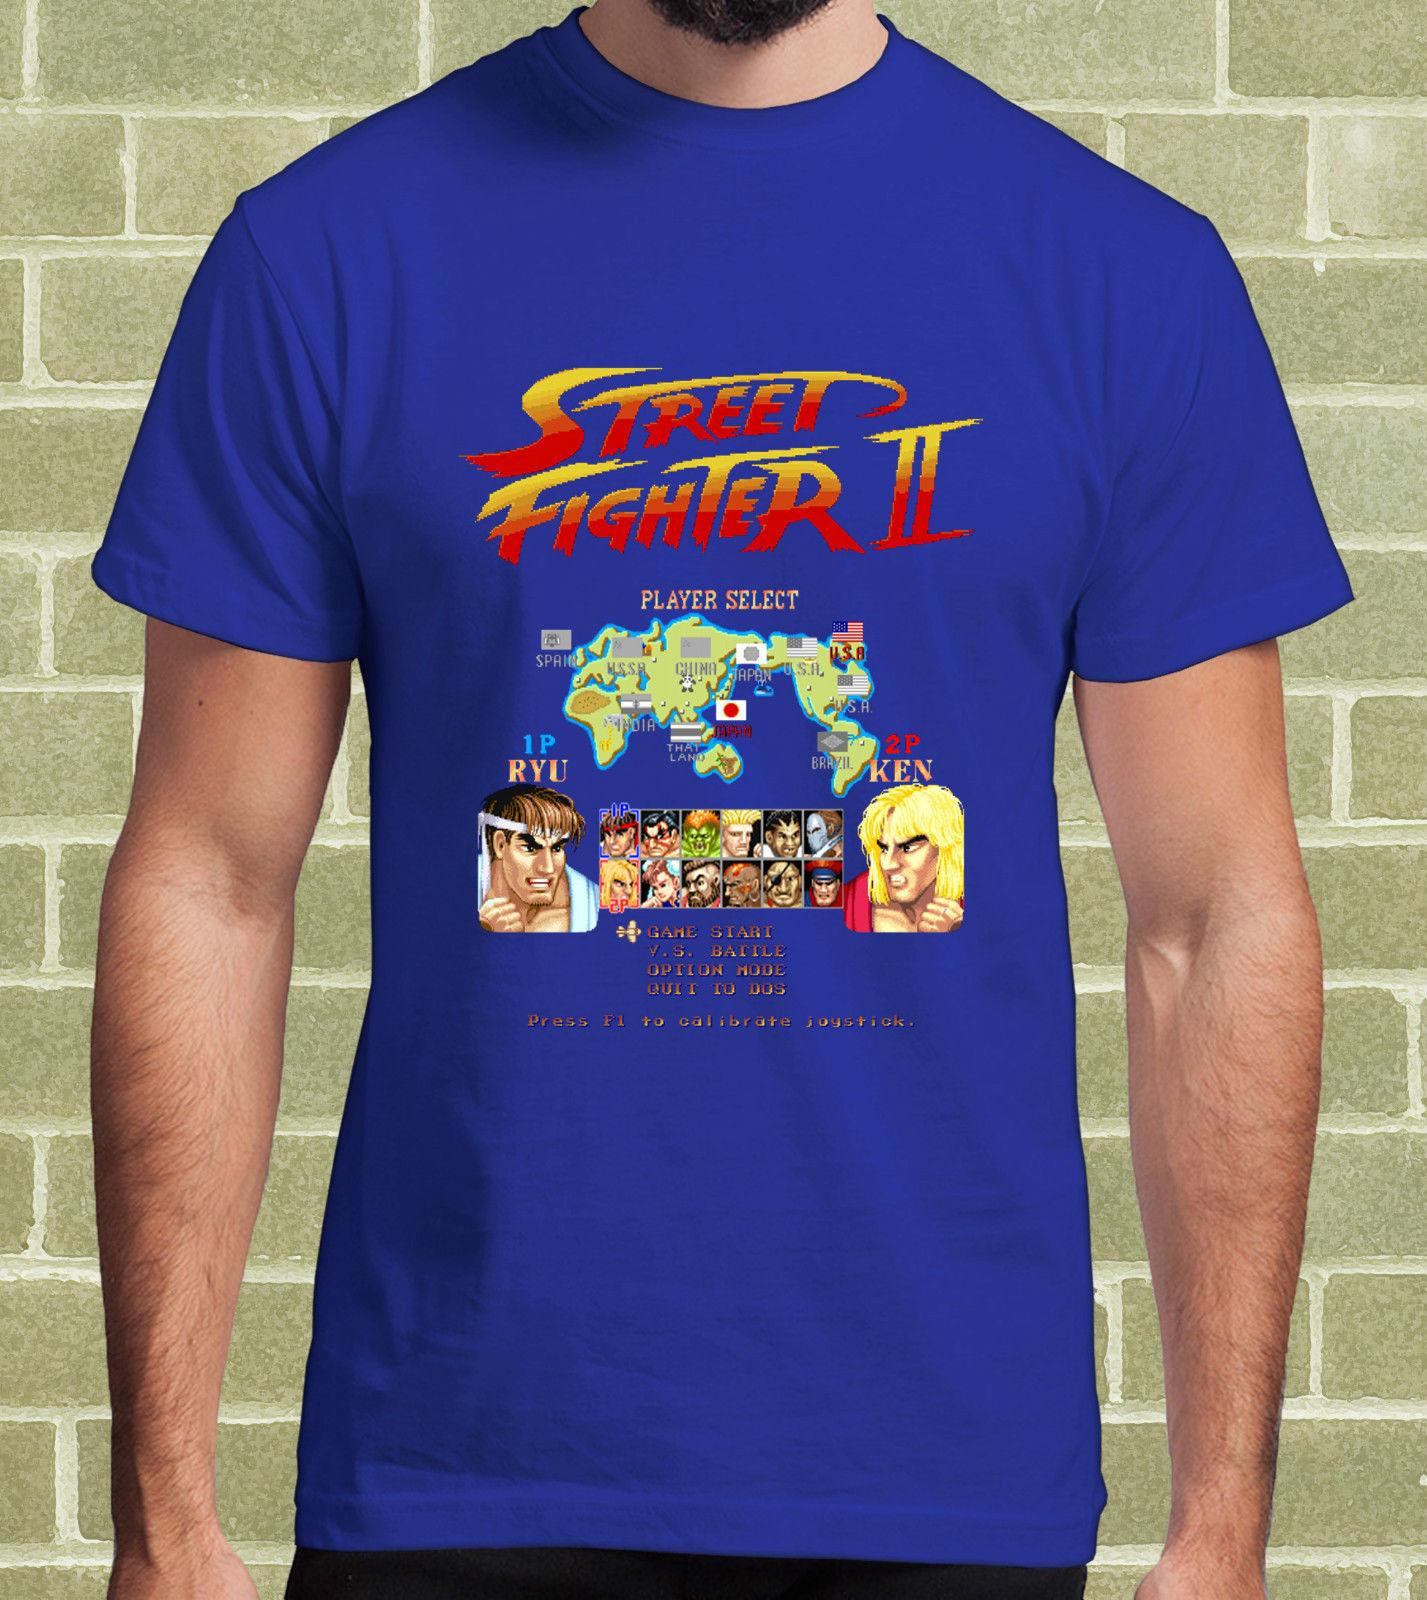 gildan-street-fighter-2-street-fighter-ii-fontbvideogame-b-font-arcade-t-shirt-per-uomo-e-bambino-me